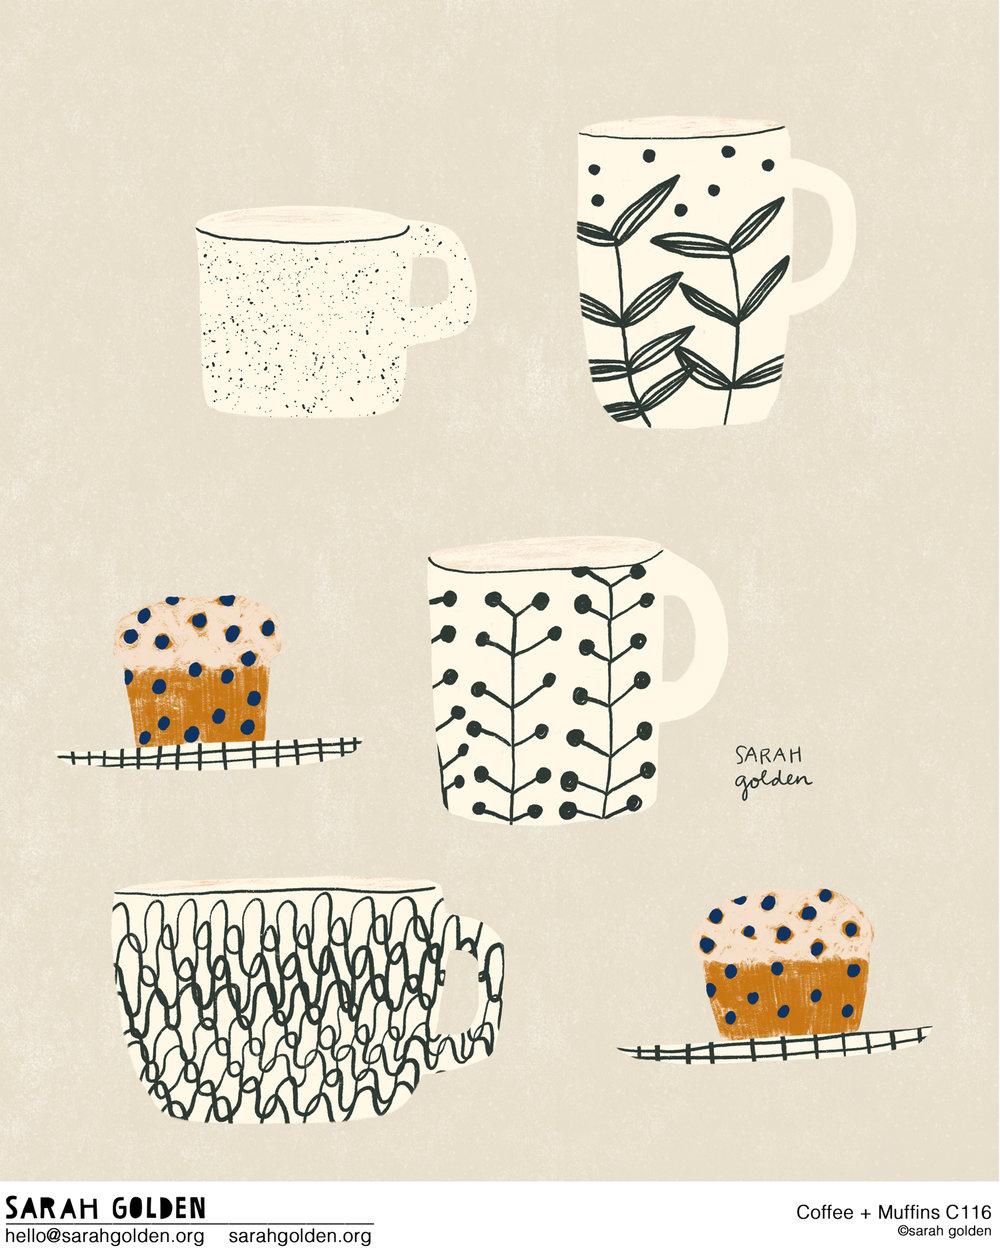 Coffee_Muffins_C116_Catalog_Sarah_Golden_logo_web.jpg